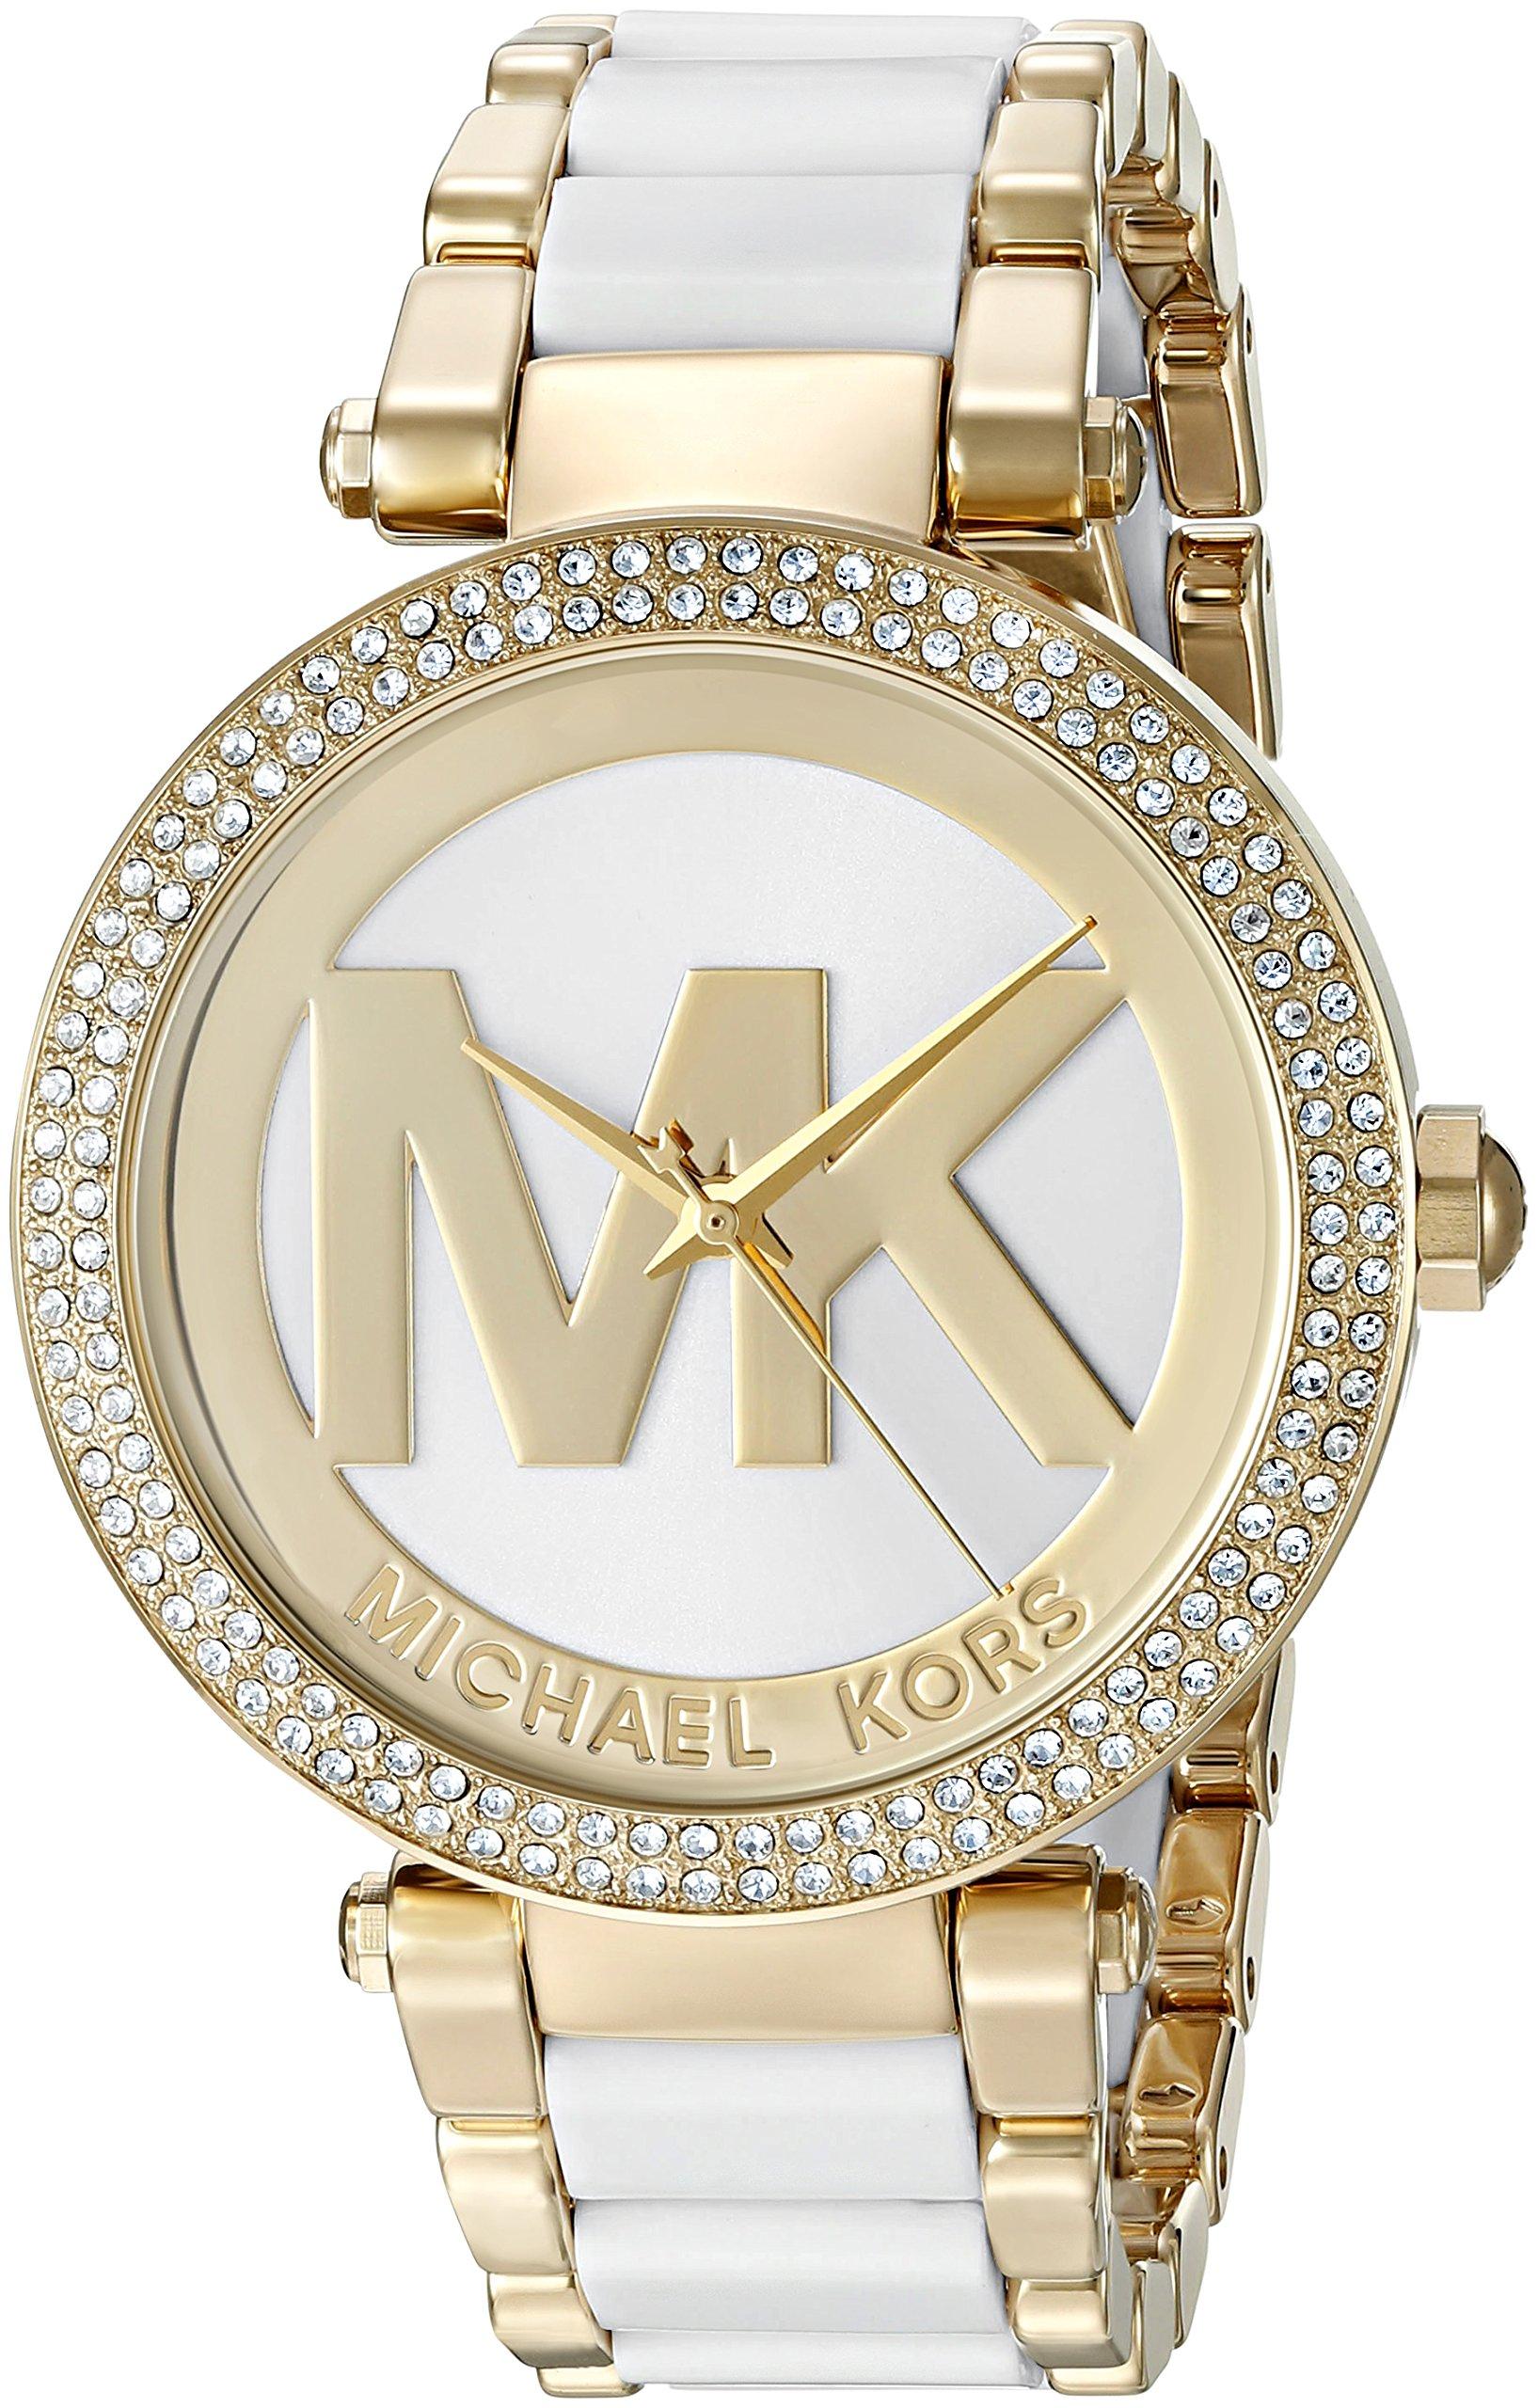 Michael Kors Women's Parker Gold-Tone Watch MK6313 by Michael Kors